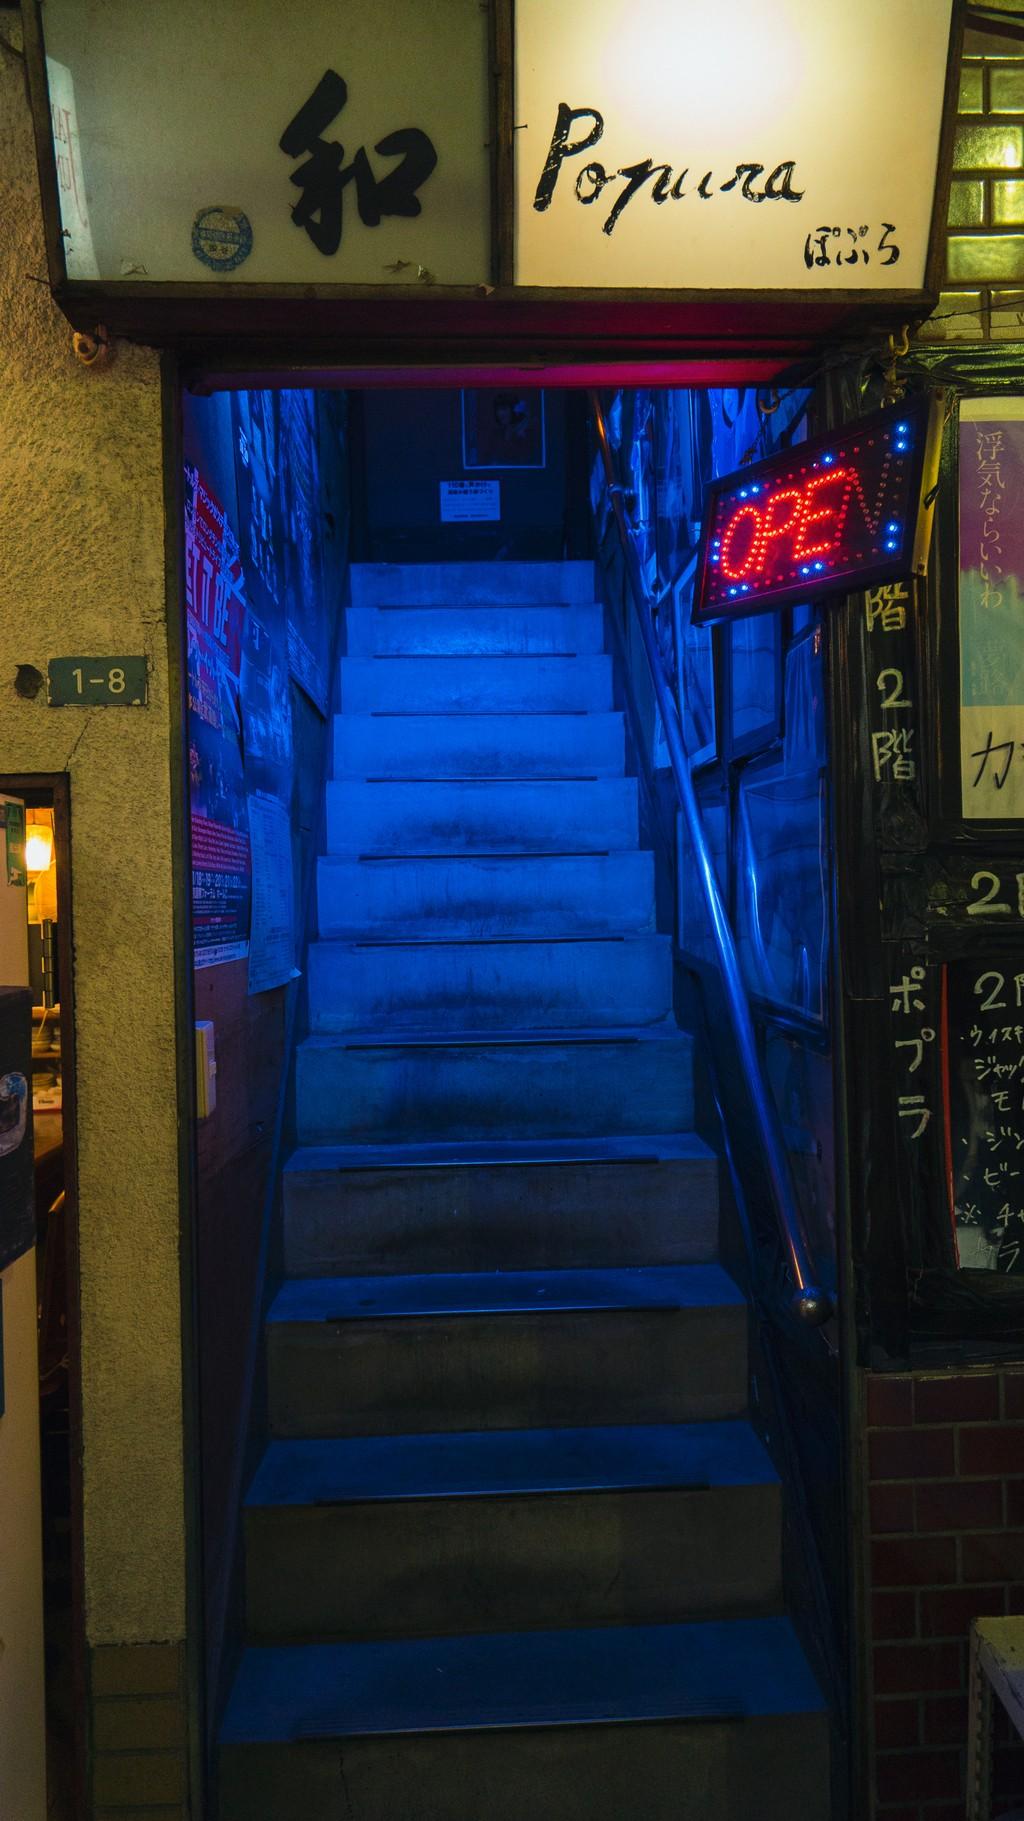 stair golden gai shinjuku golden gai tokyo golden gai in shinjuku golden gai shinjuku tokyo japan